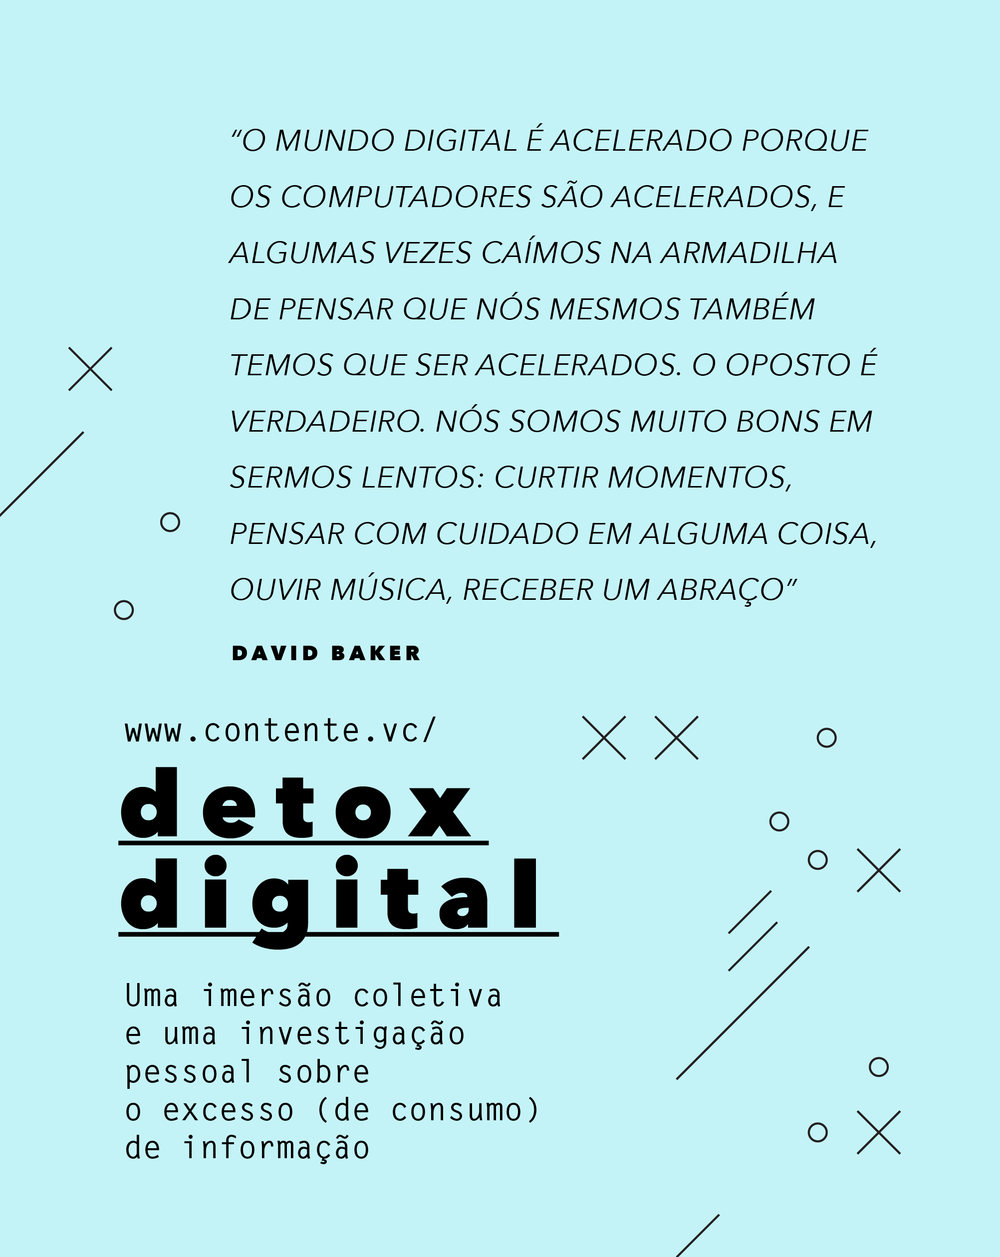 dettoxdigital-05.png